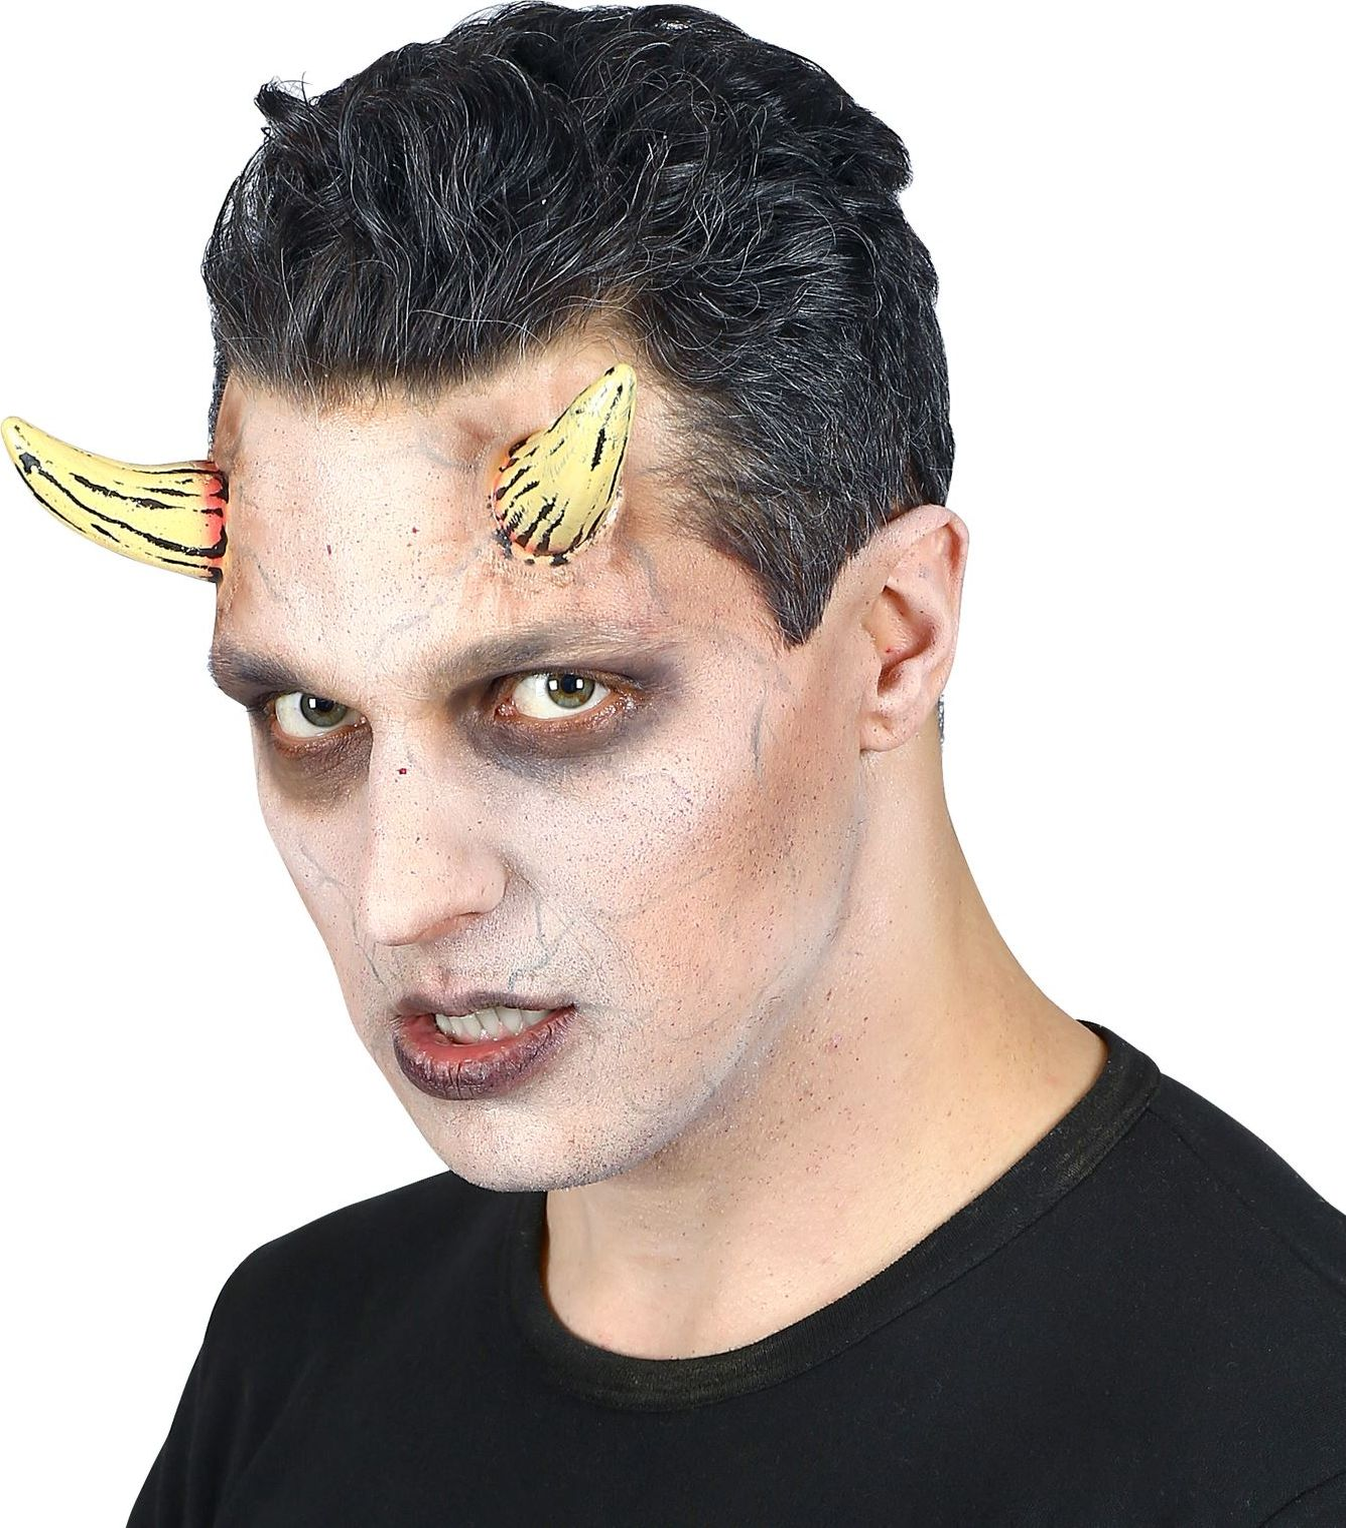 Opplakbare demonen hoorntjes